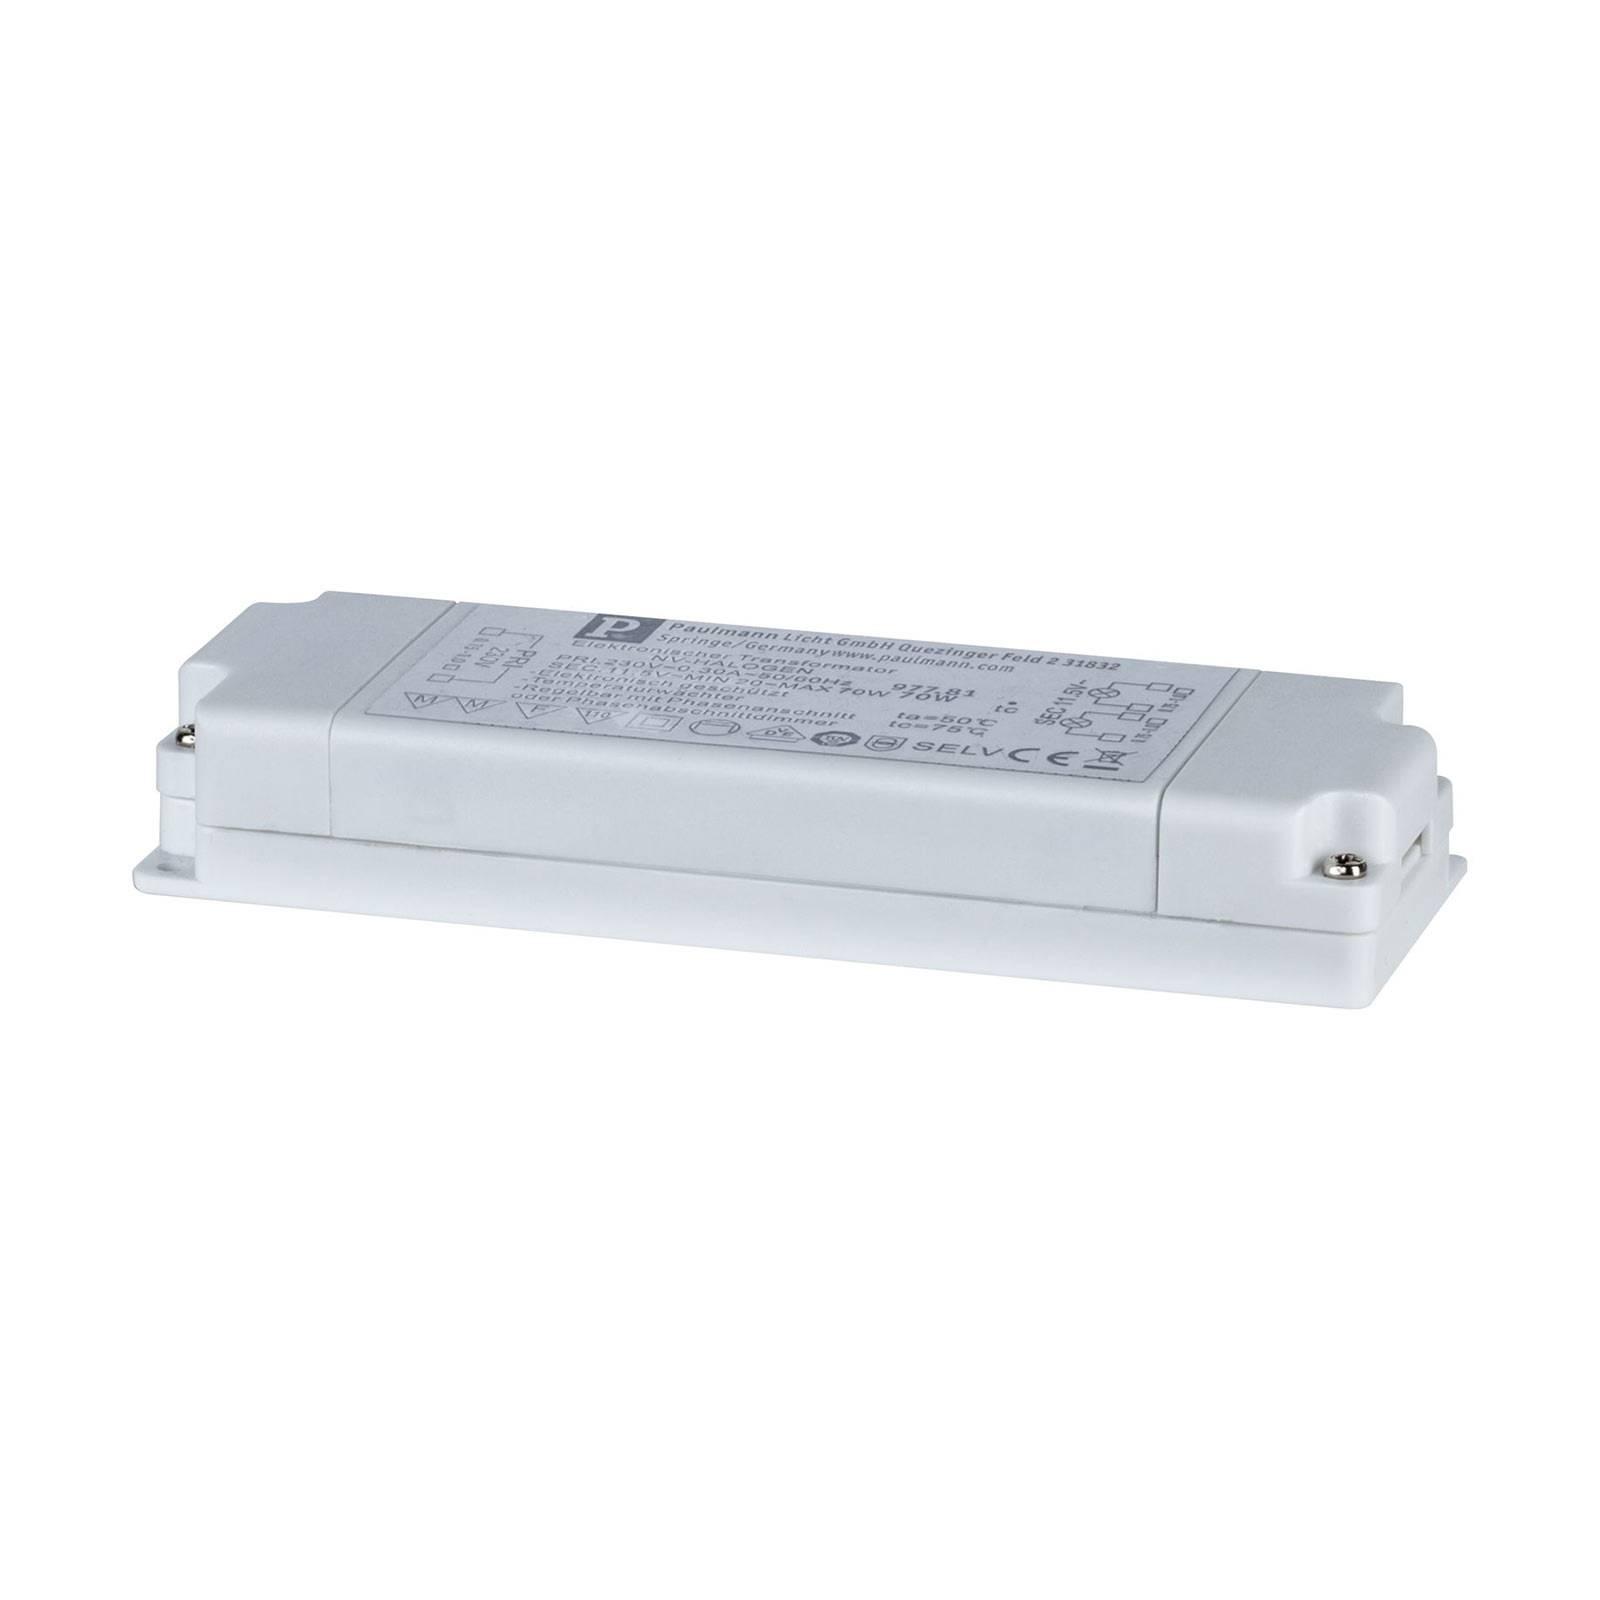 VDE Flat Elektroniktrafo 20-70 W 230/12 V 70 VA